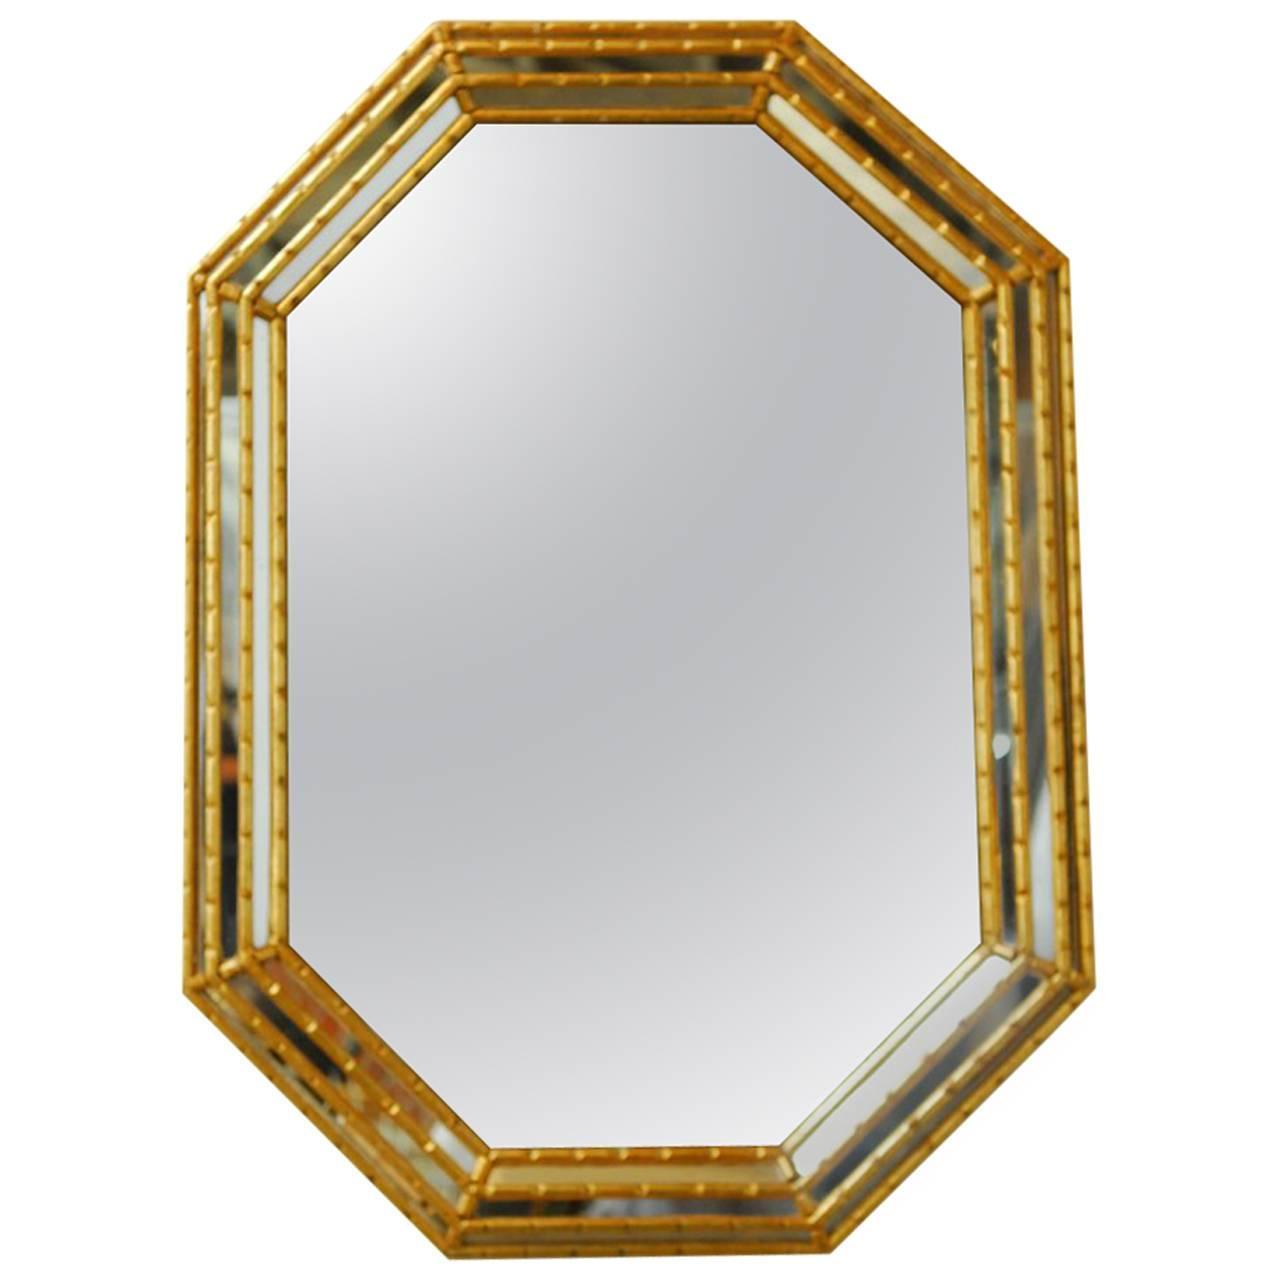 midcentury labarge octagonal faux bamboo mirror